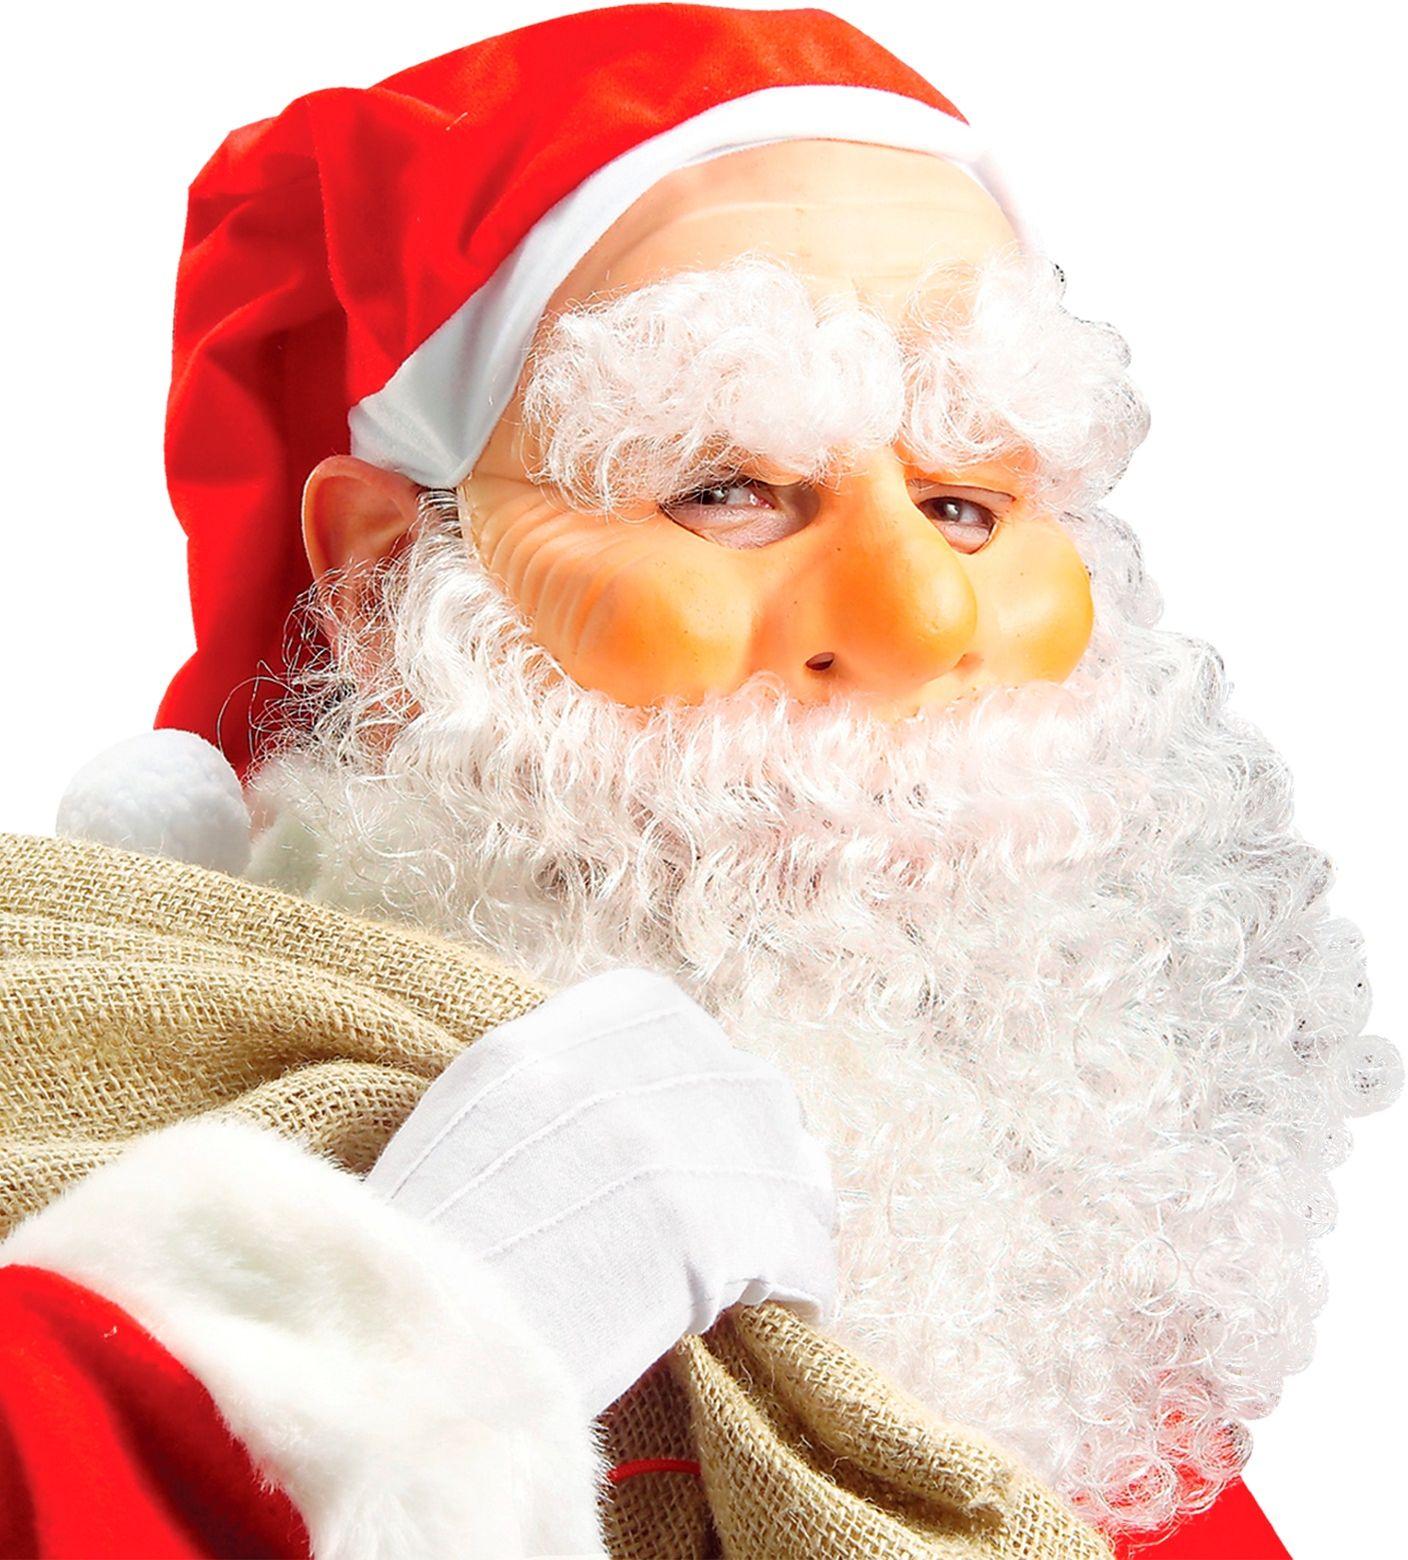 Kerstman masker, muts, baard, snor en wenkbrauwen